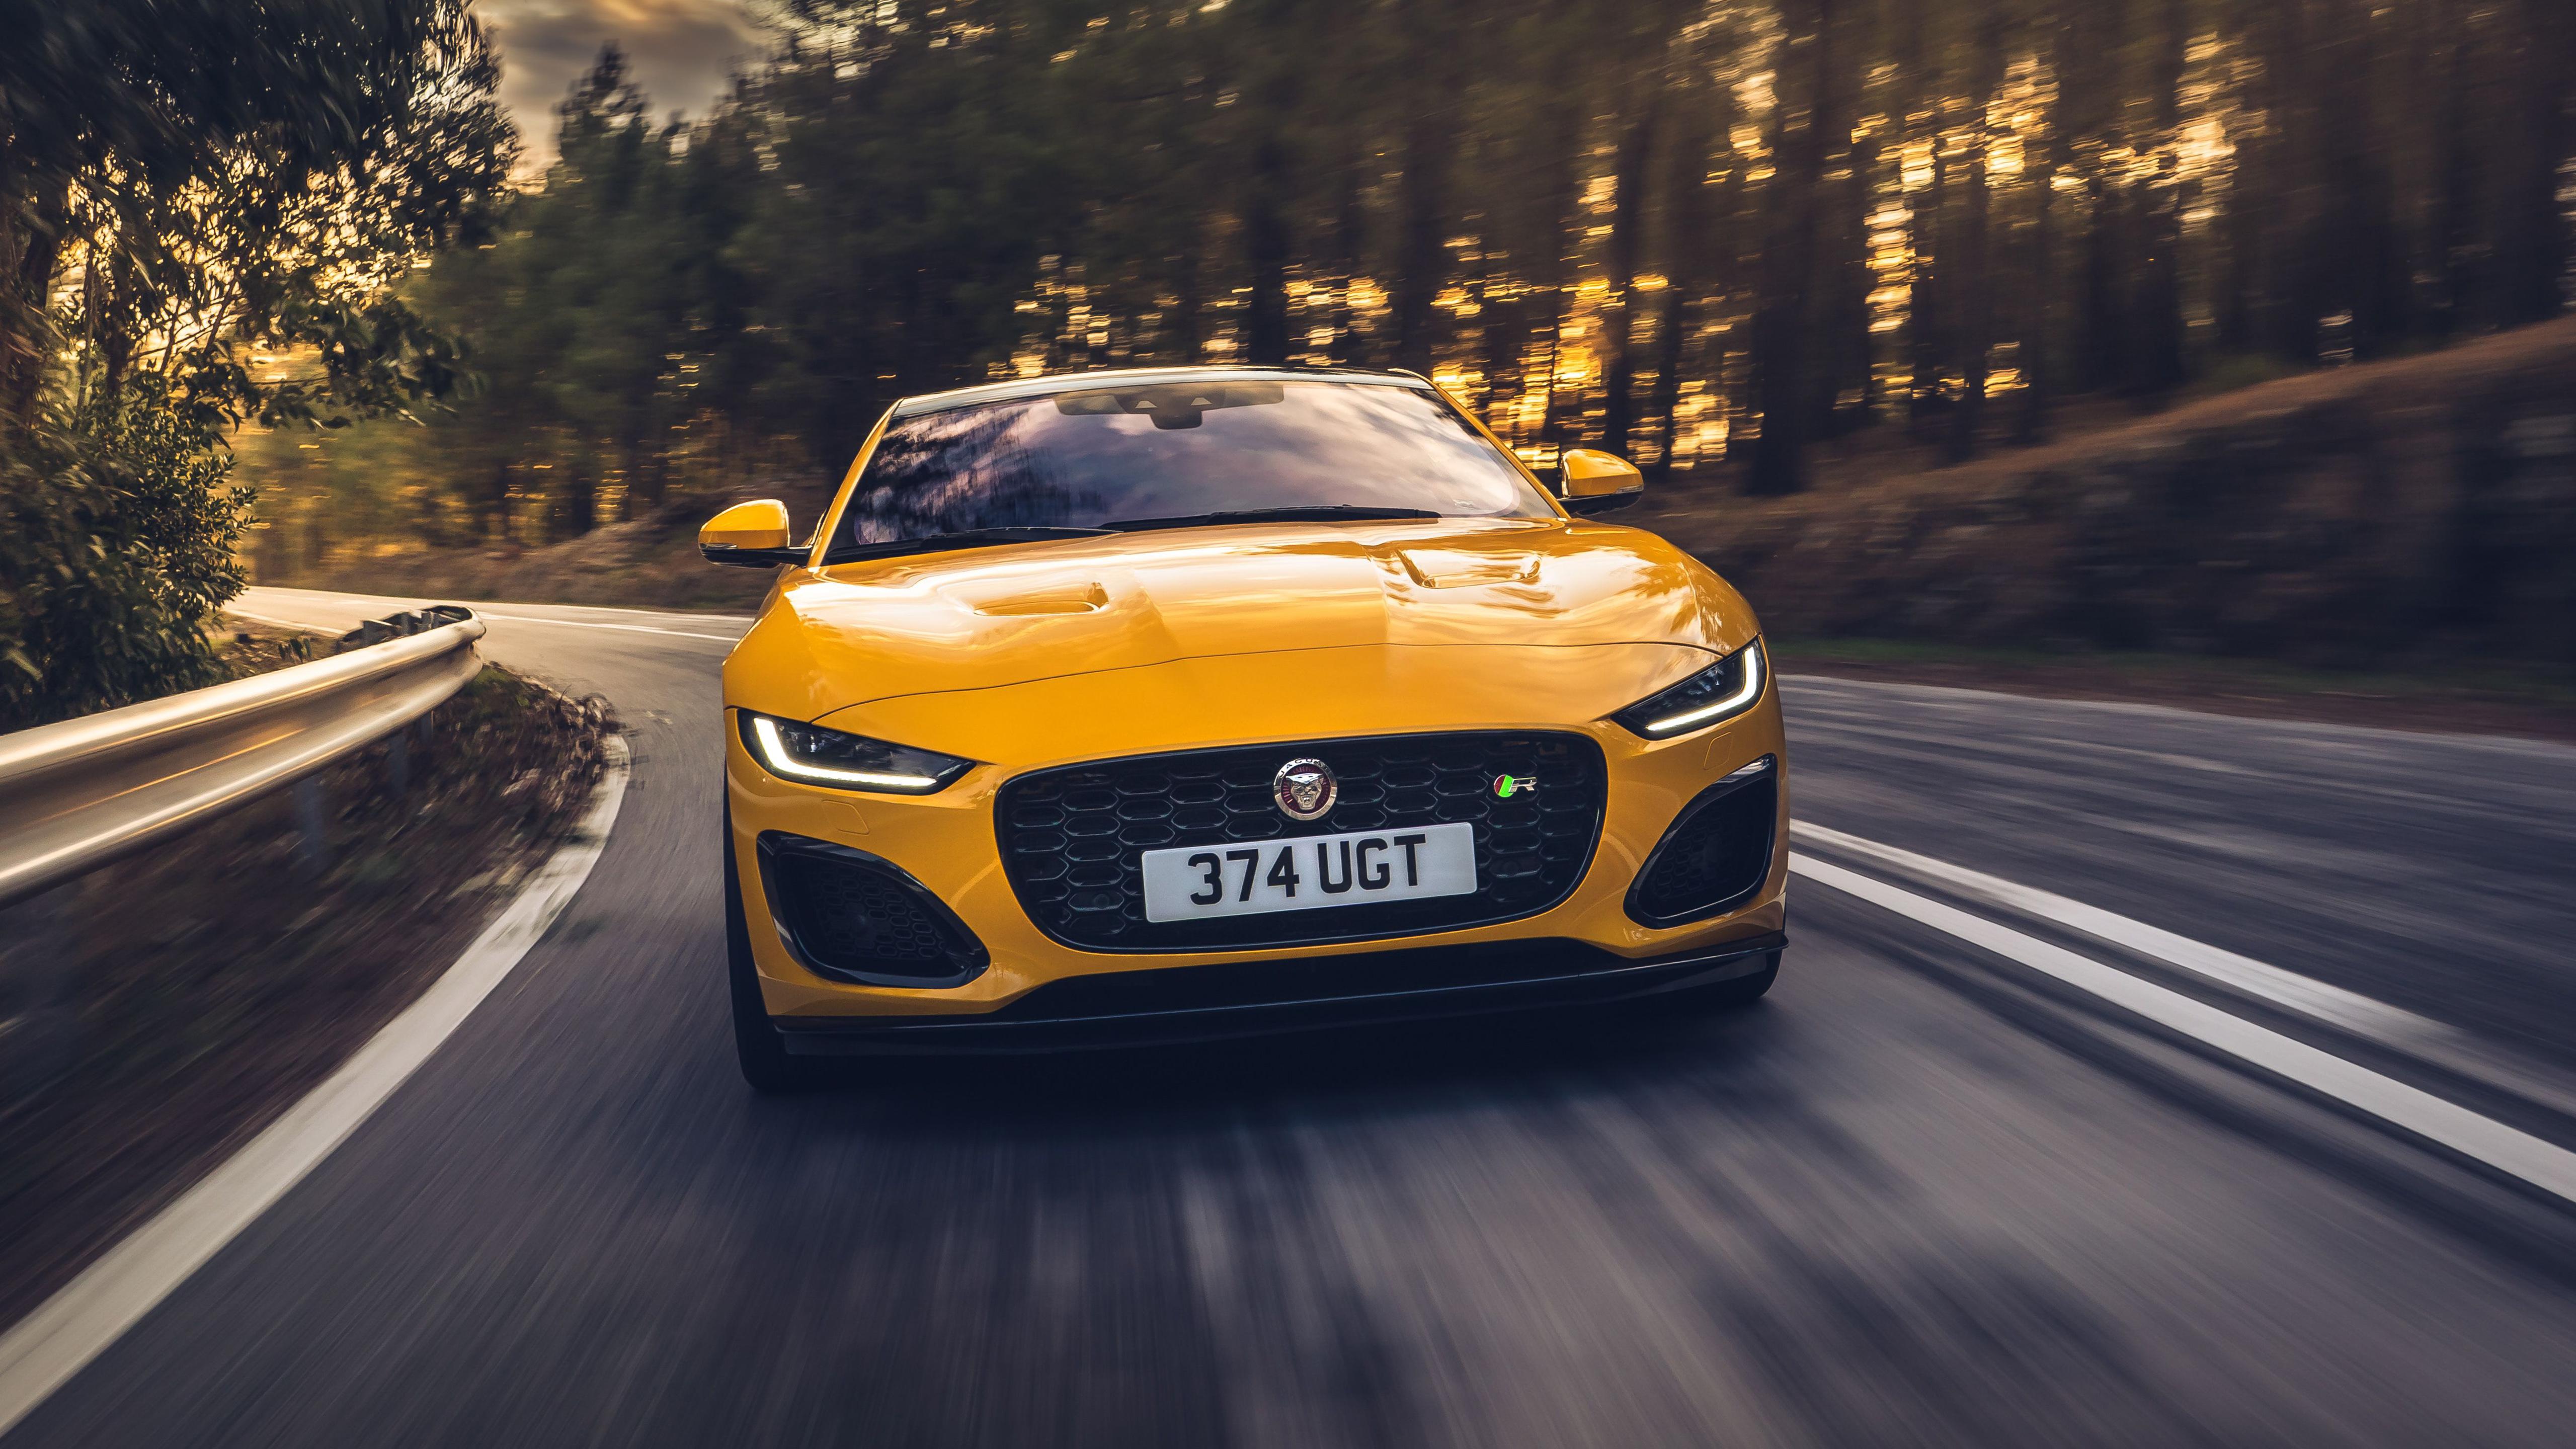 Jaguar F Type R Coupe 2020 5k 2 Wallpaper Hd Car Wallpapers Id 14247